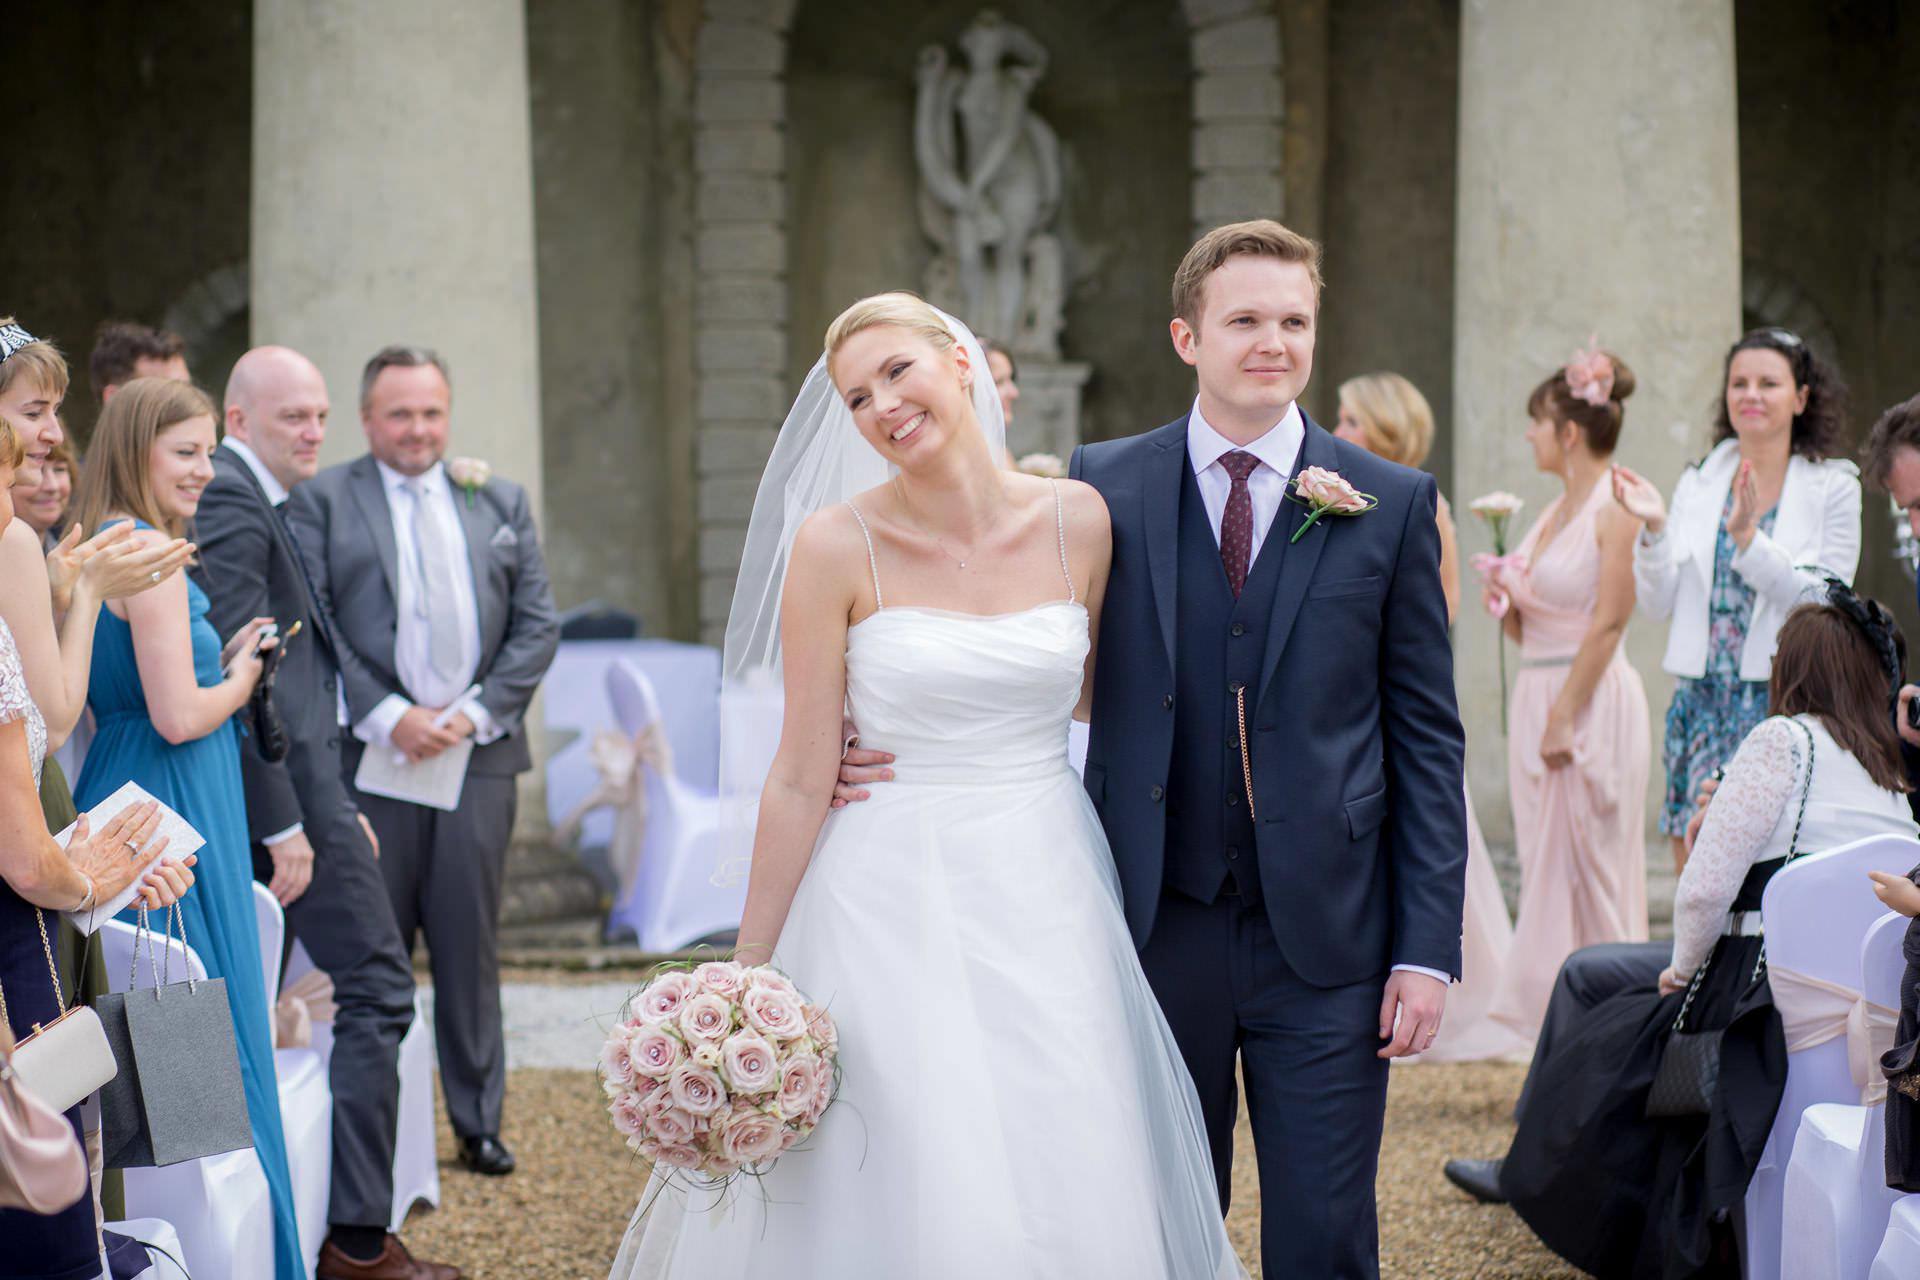 Wotton House wedding married couple walking